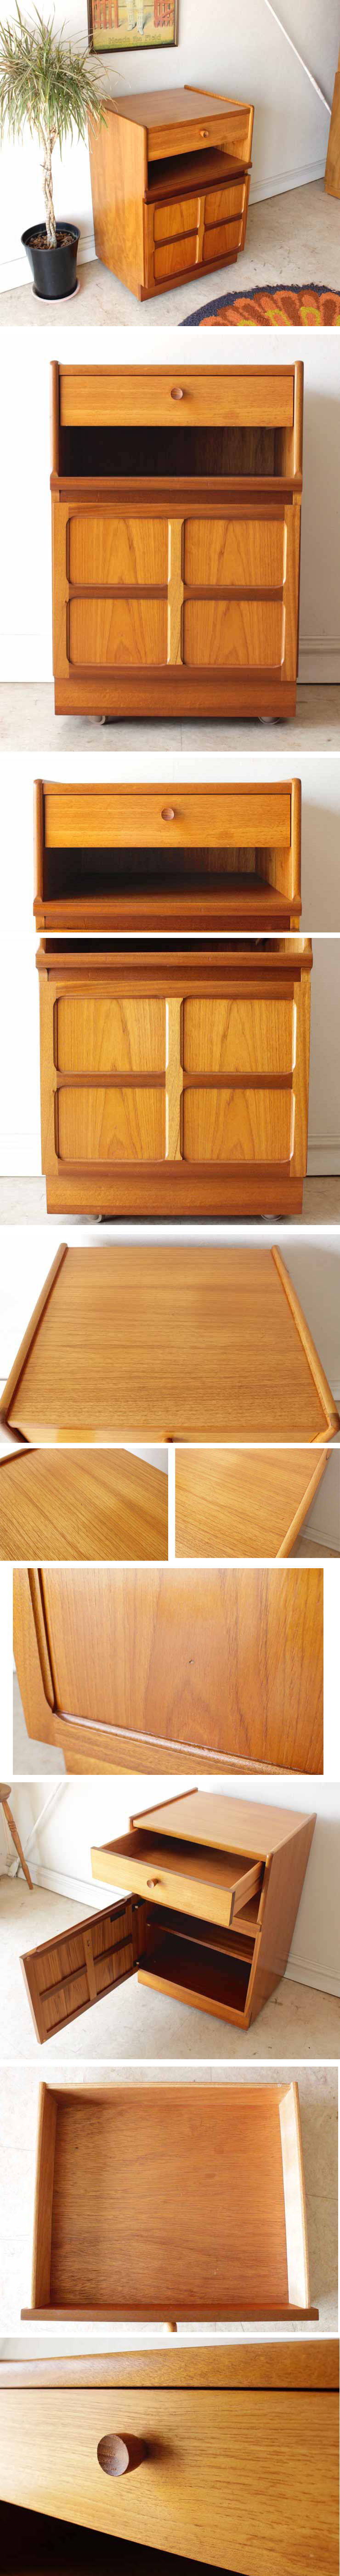 Nathan・ネイサン・キャビネット・収納棚・チーク・イギリス製・ビンテージ家具